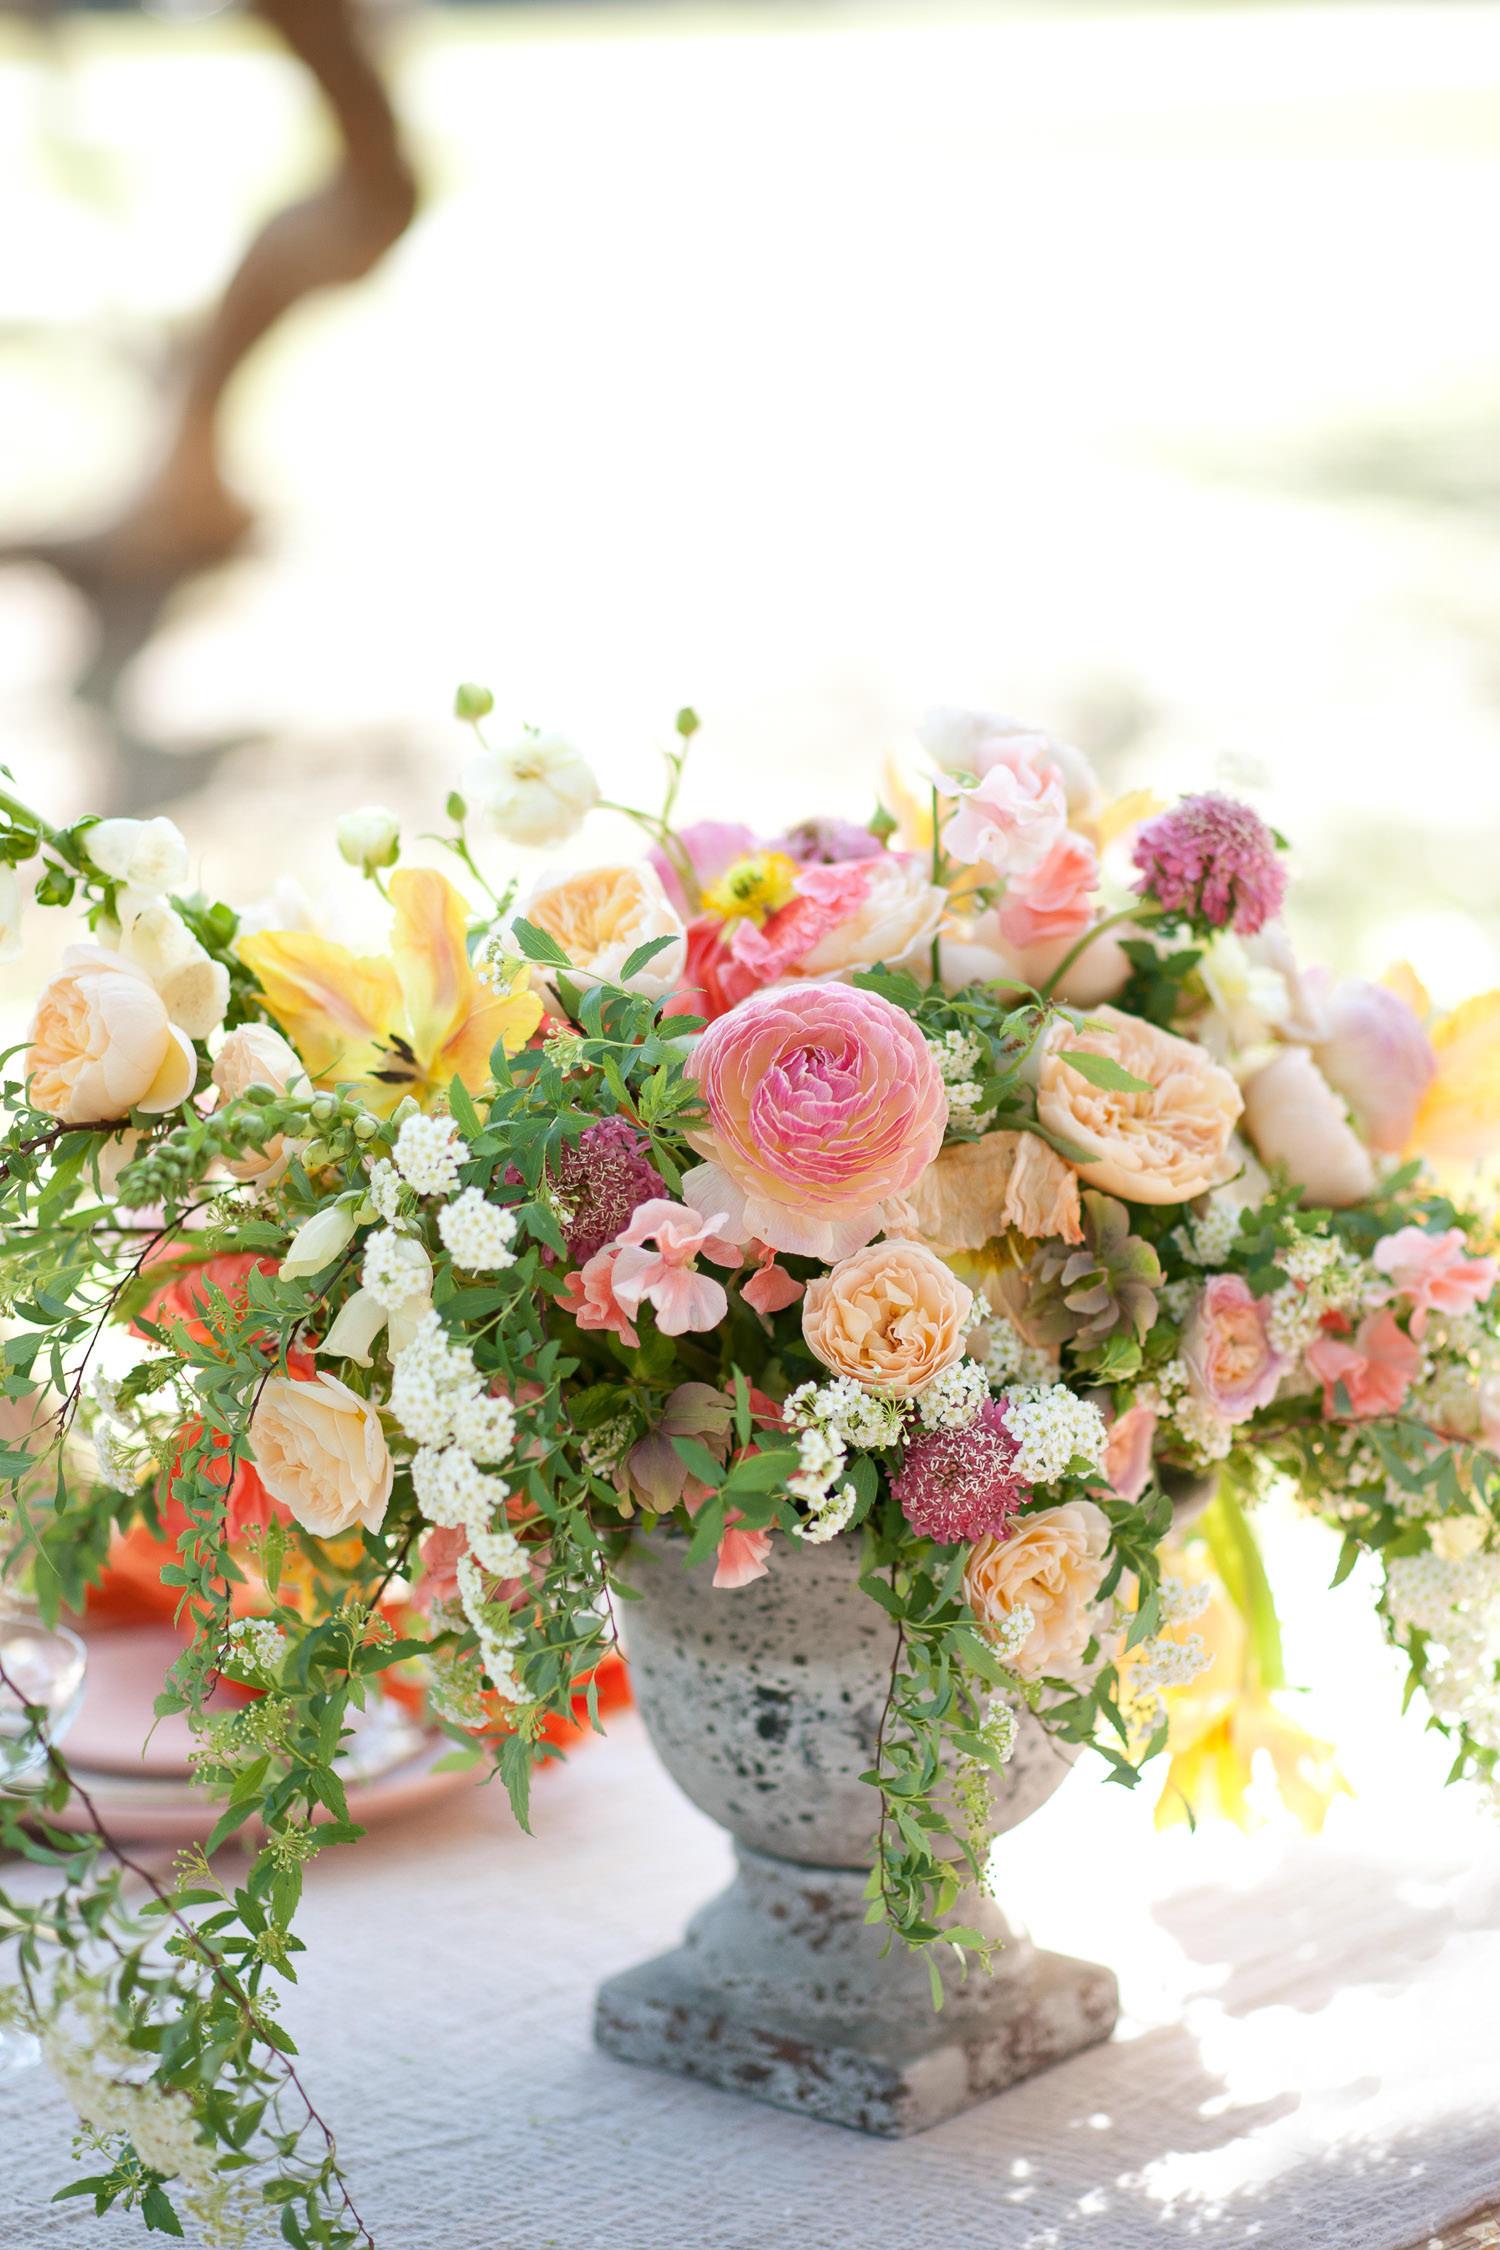 Spring centerpiece at a garden wedding captured by Tara Whittaker Photography